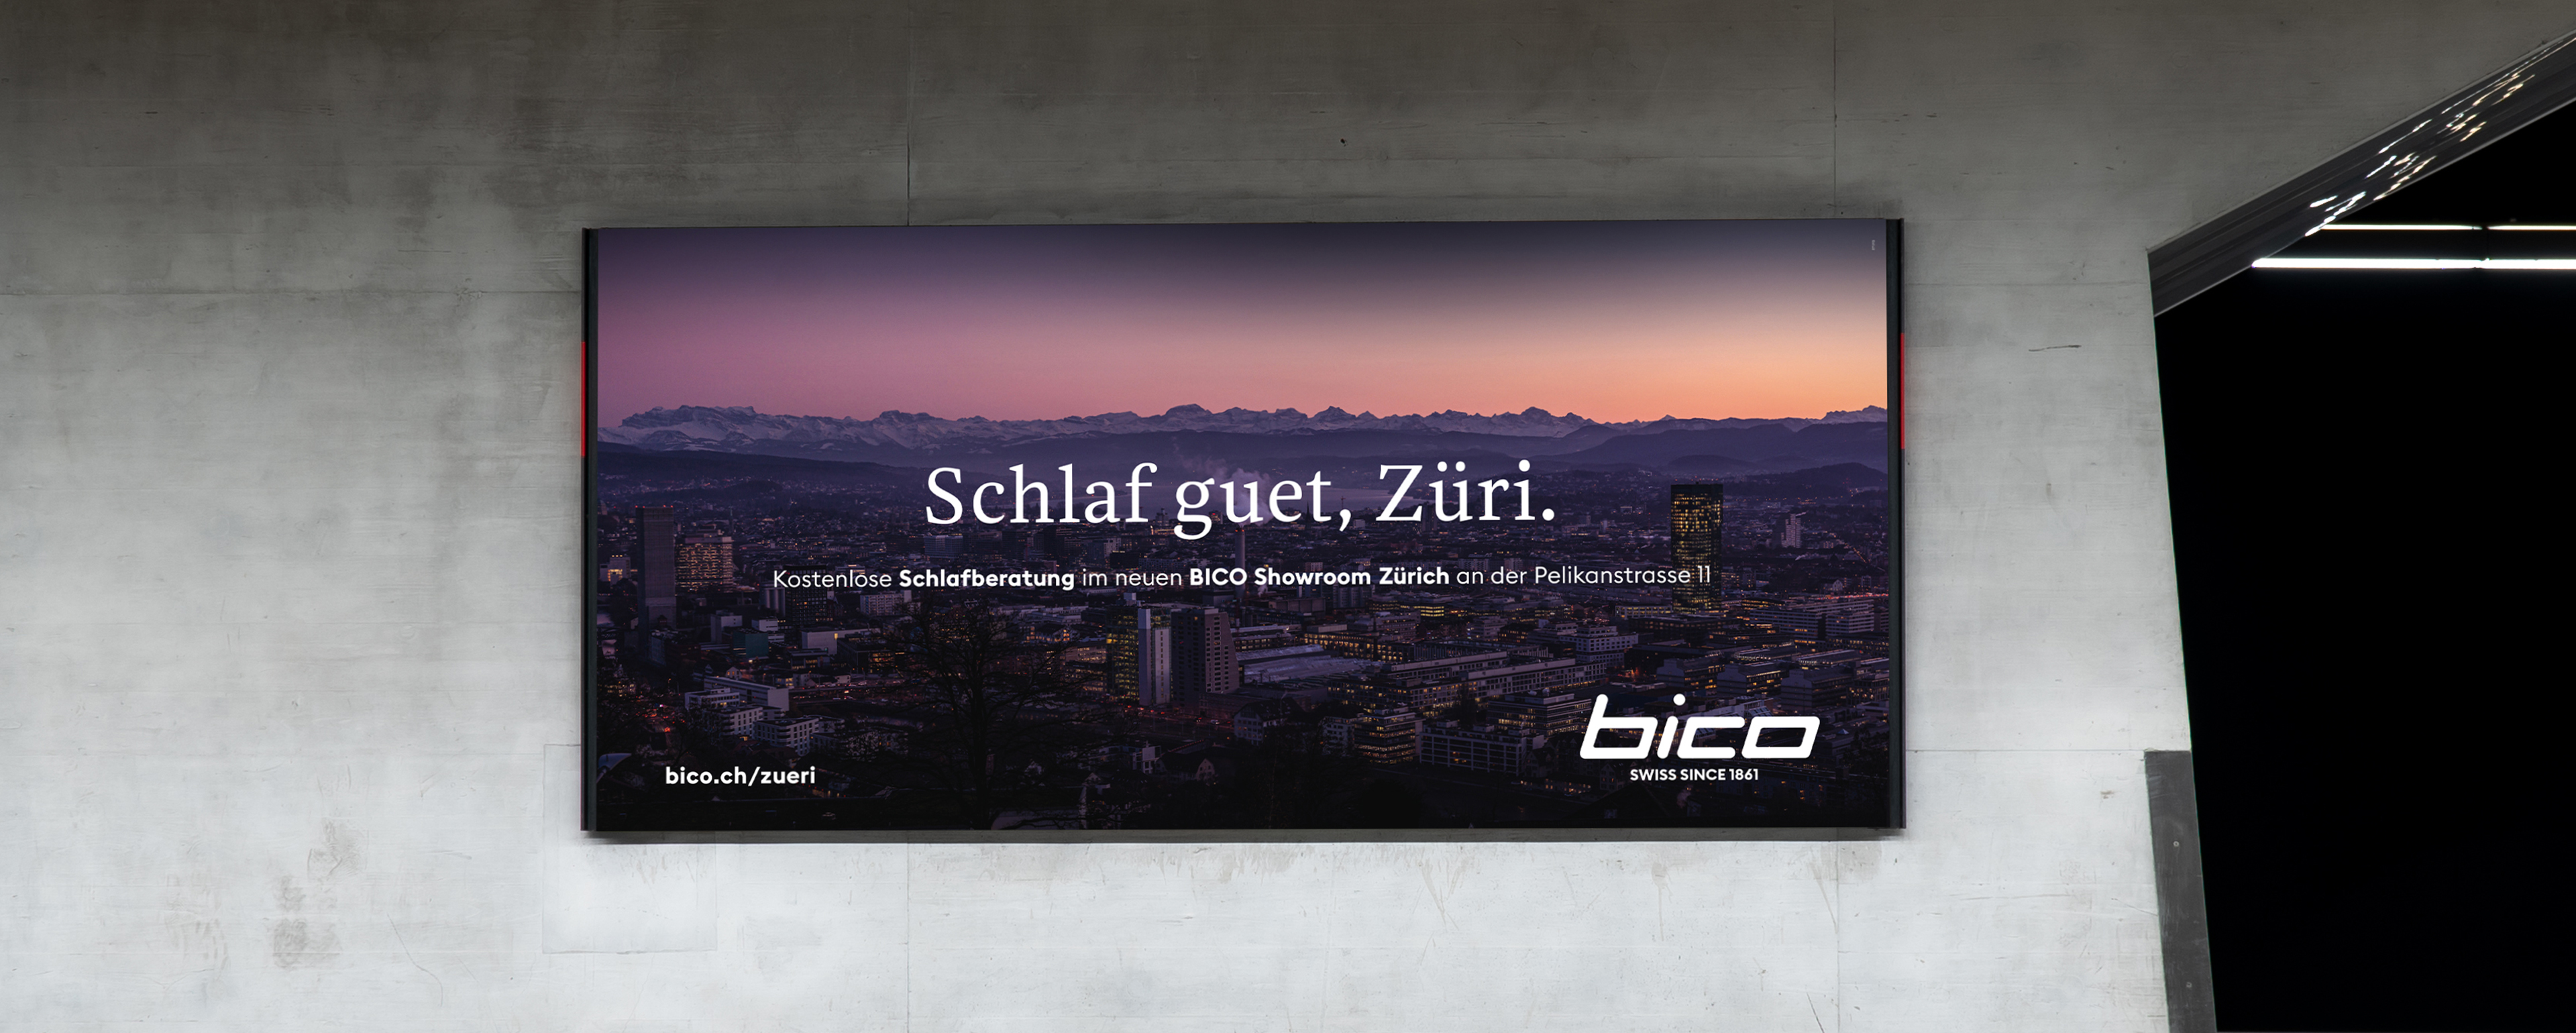 bico_header_news_launch